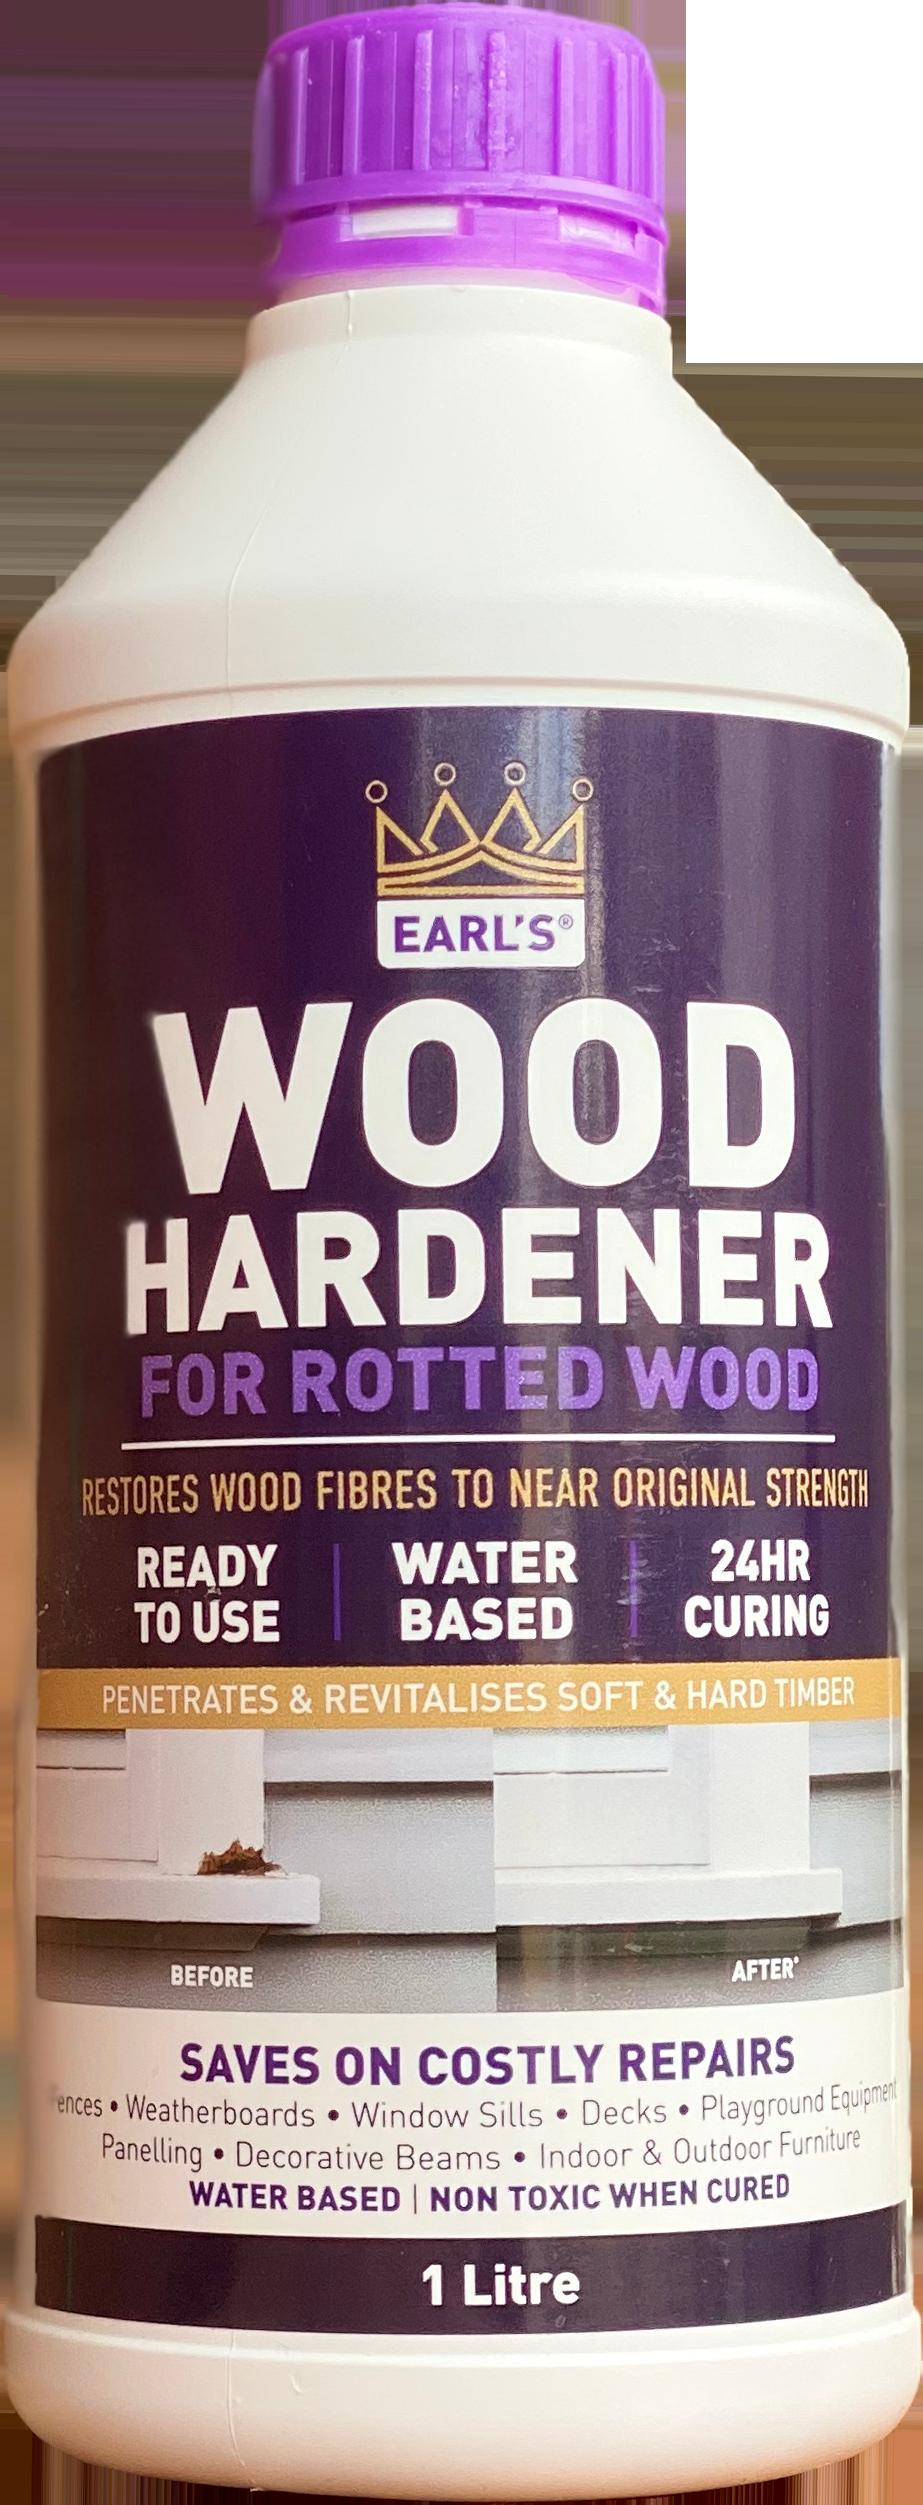 Hard-wood-2.png